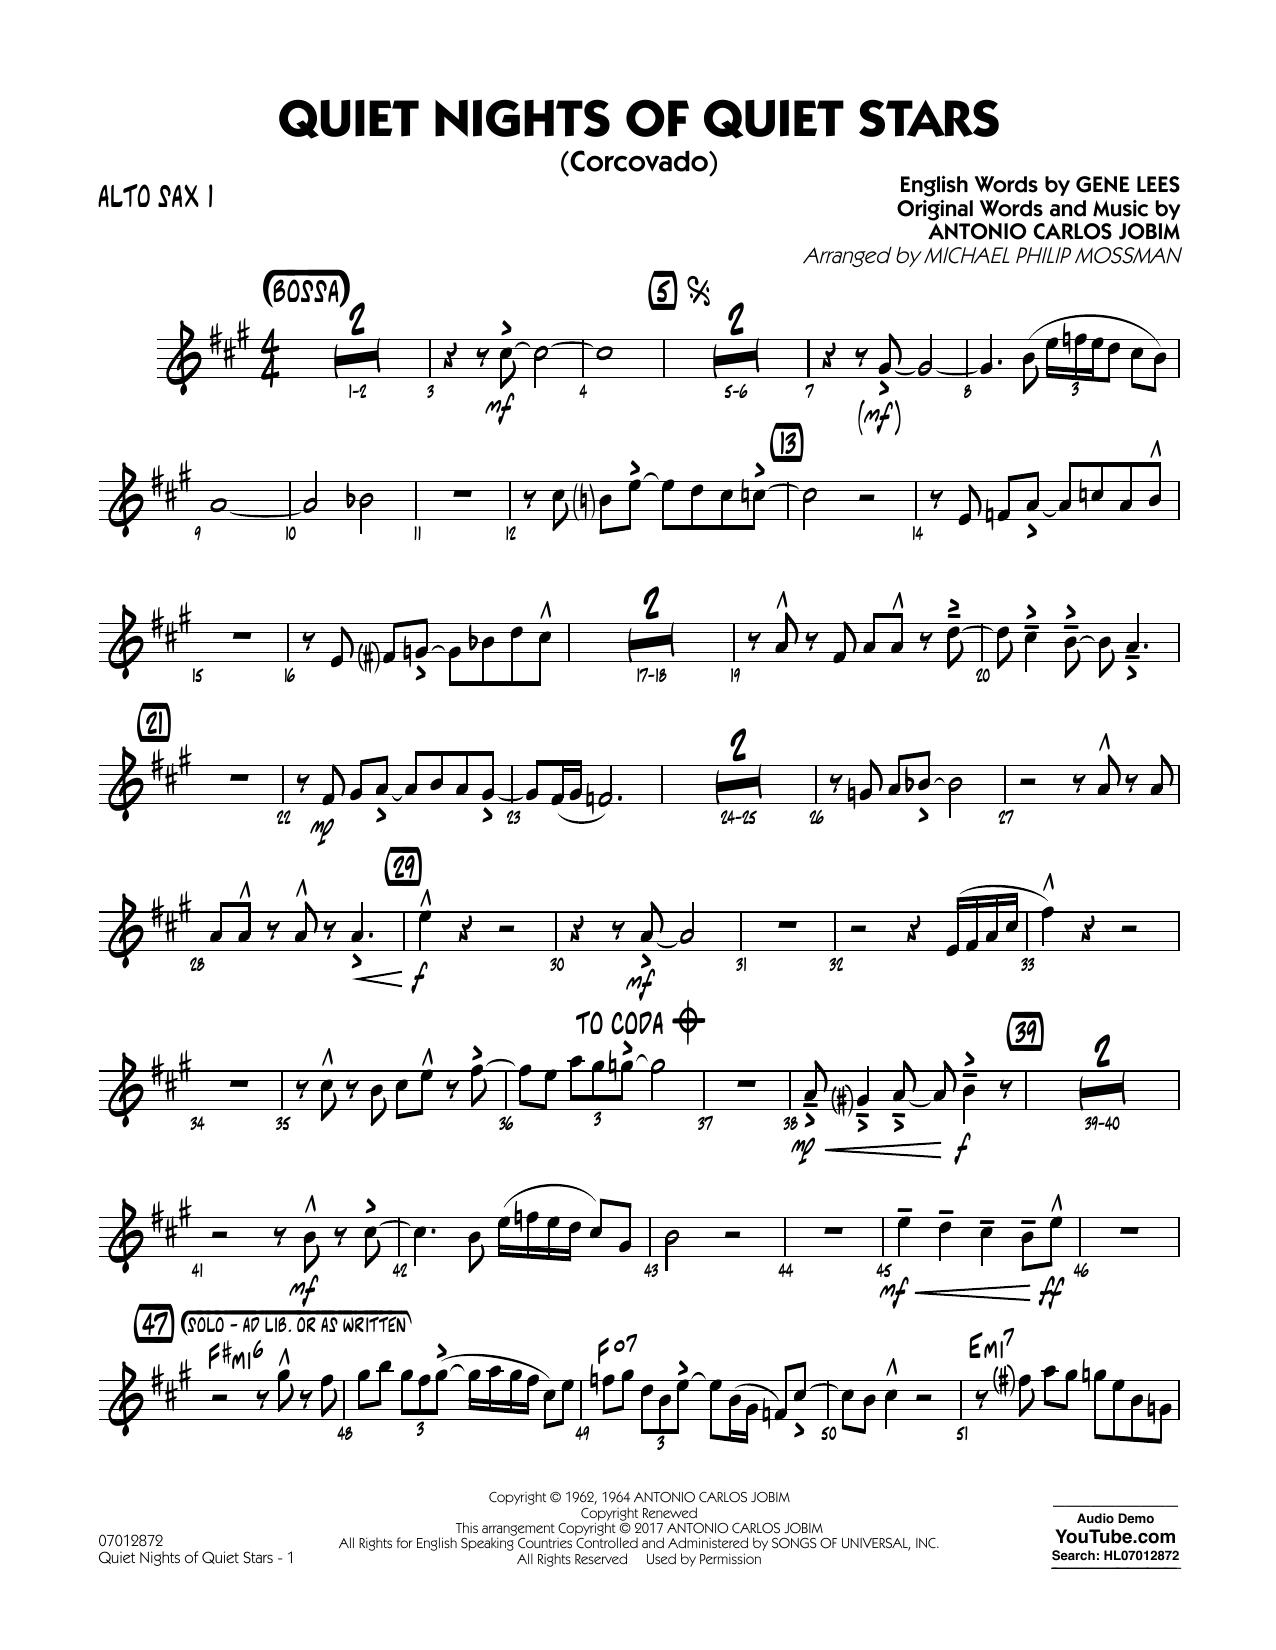 Quiet Nights of Quiet Stars (Corcovado) - Alto Sax 1 Sheet Music